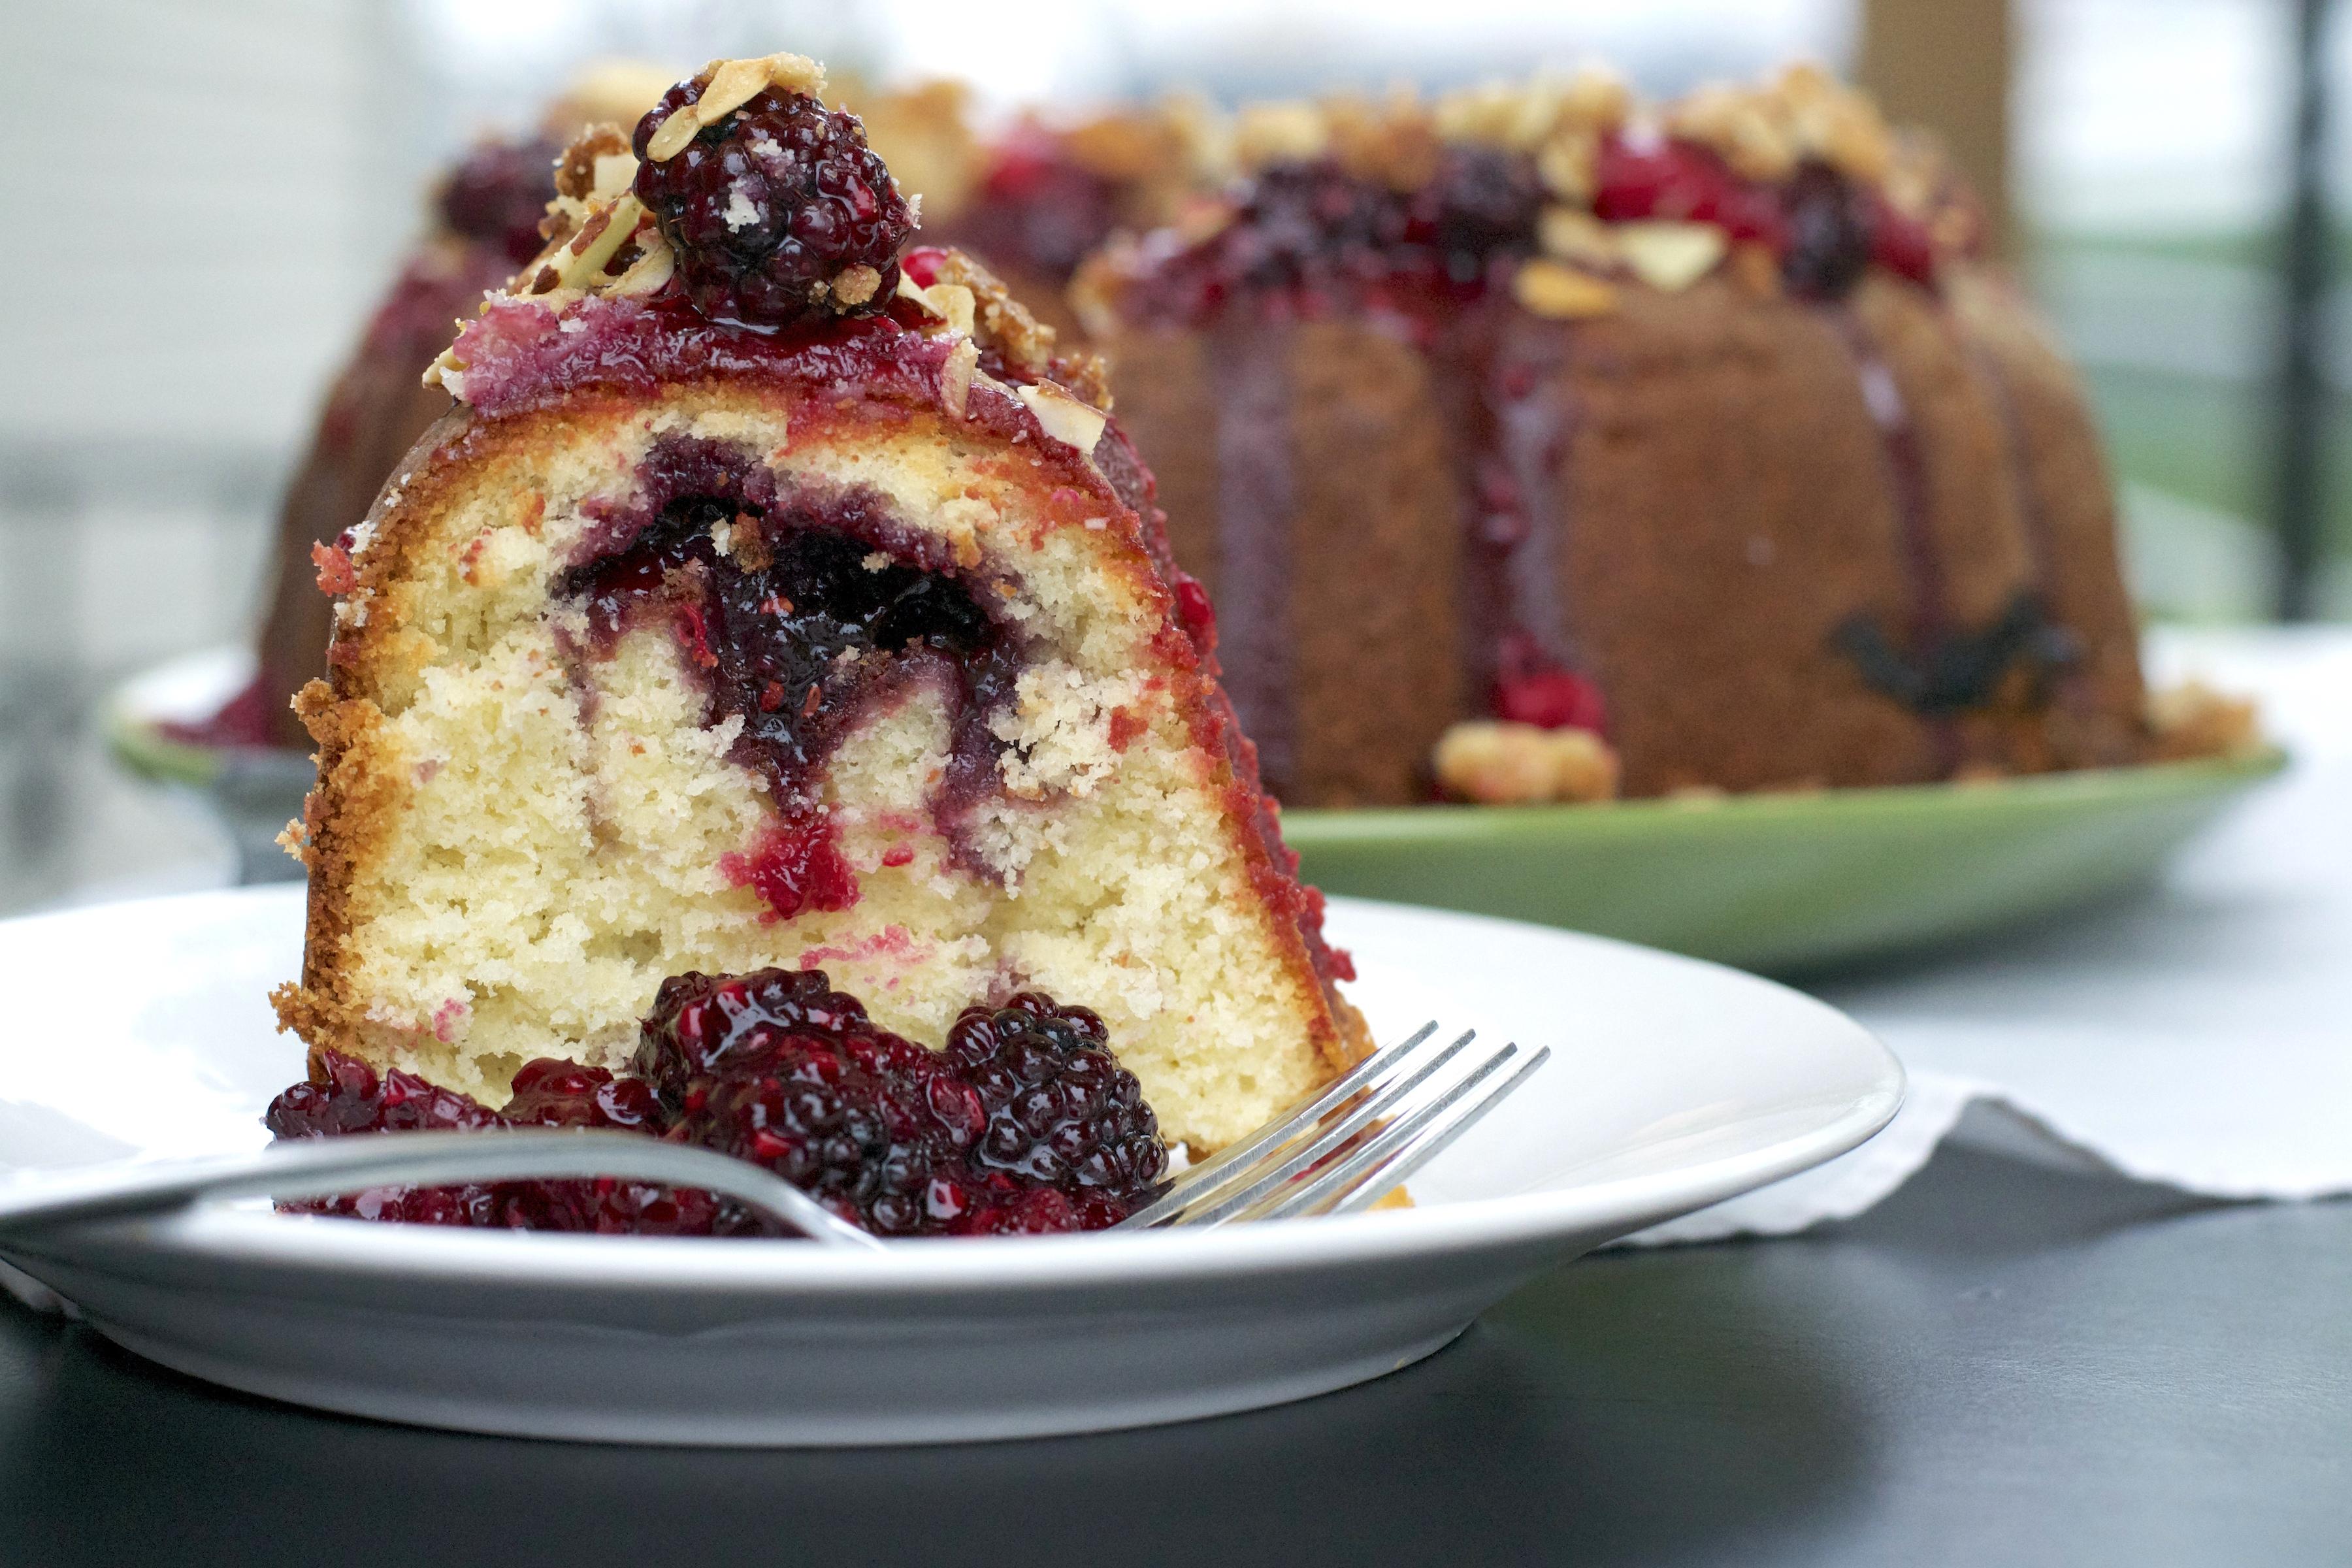 Triple Berry Bundt Cake What the Forks for Dinner